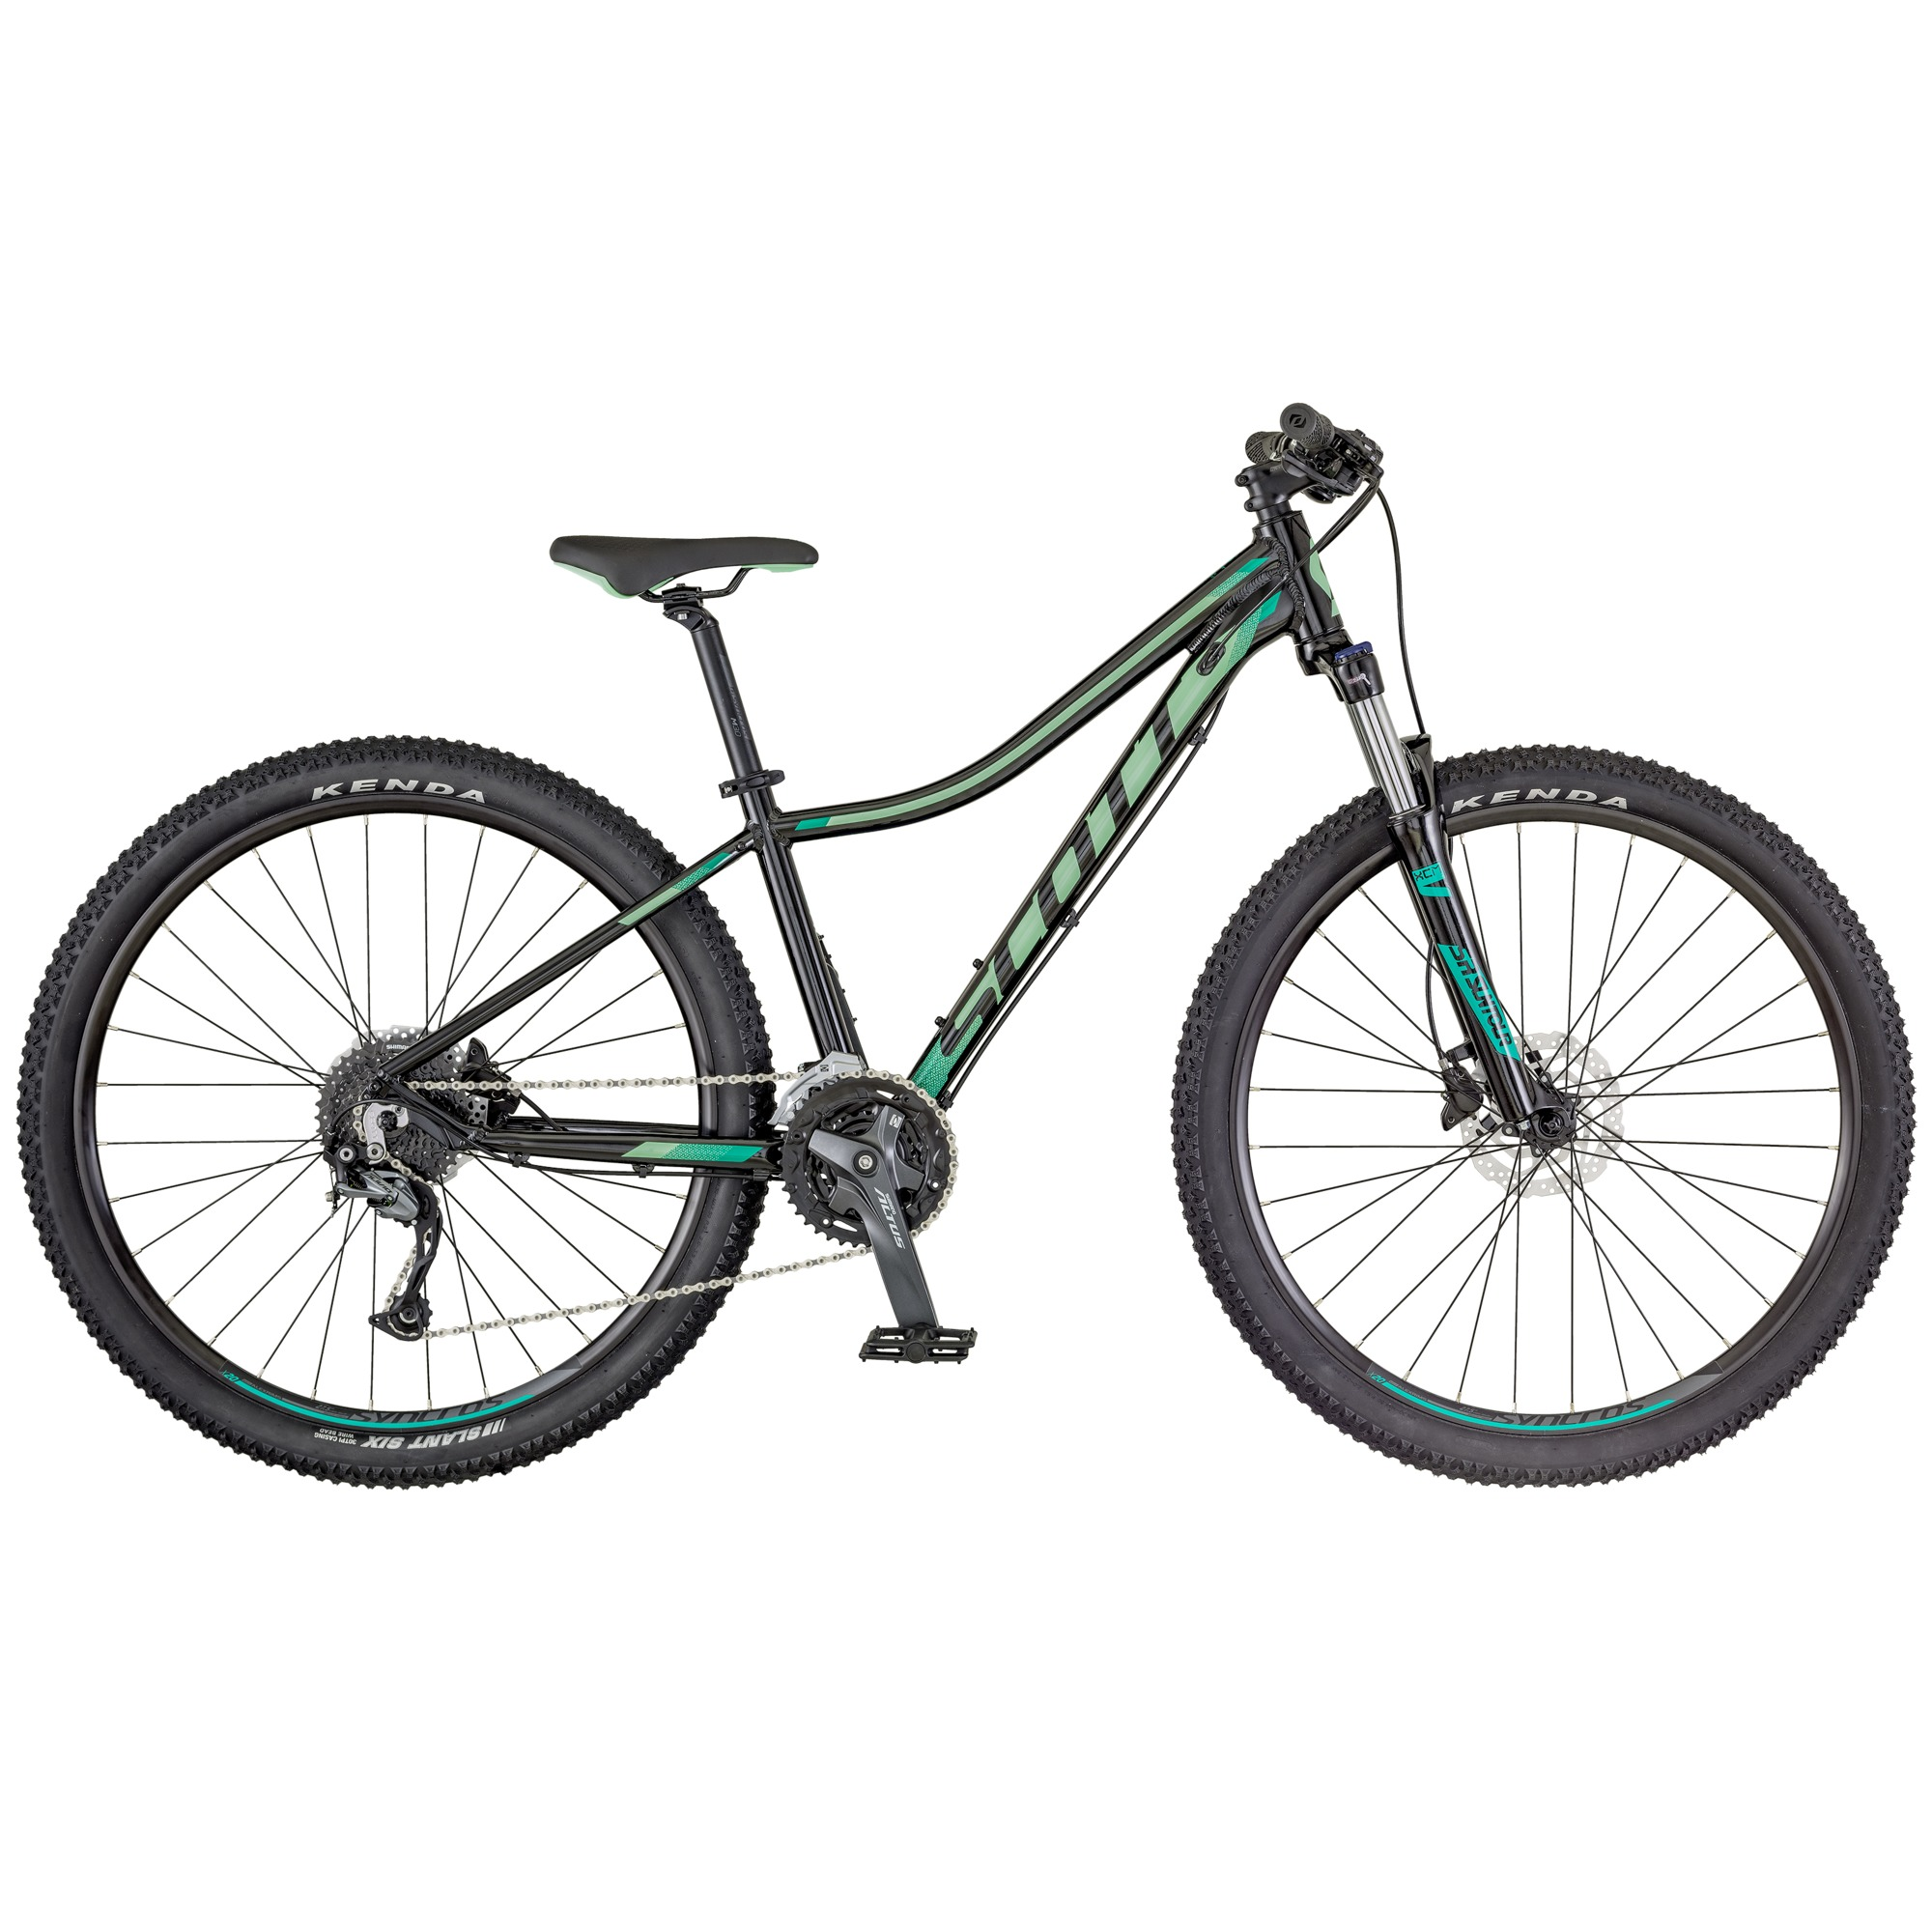 SCOTT Contessa 710 Bike L - Zweirad Homann